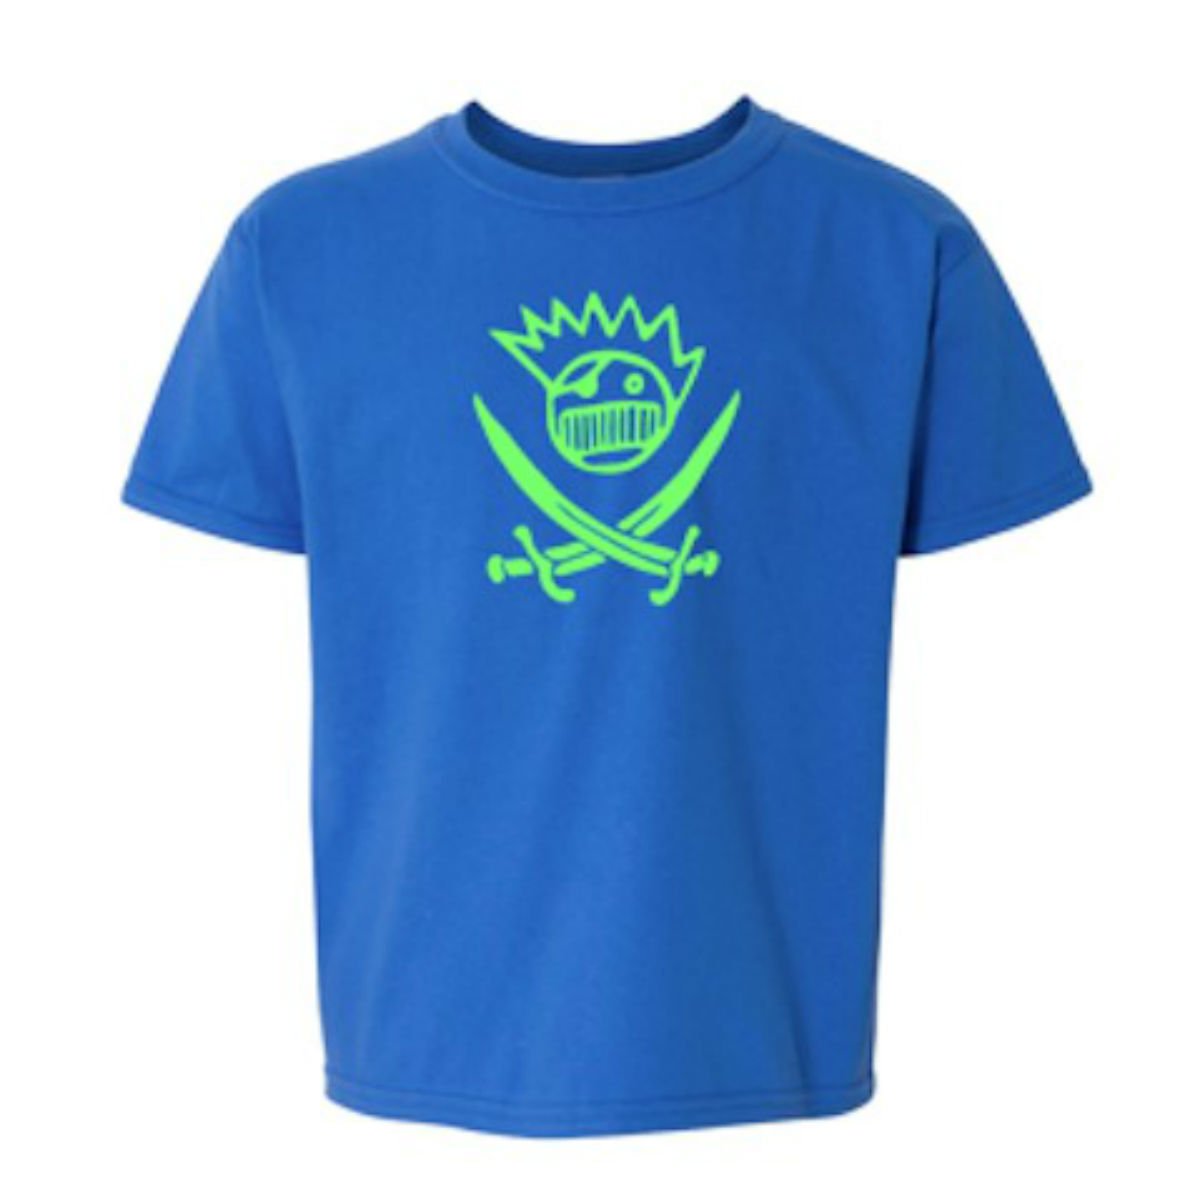 Boognish Pirate Kids' T-Shirt